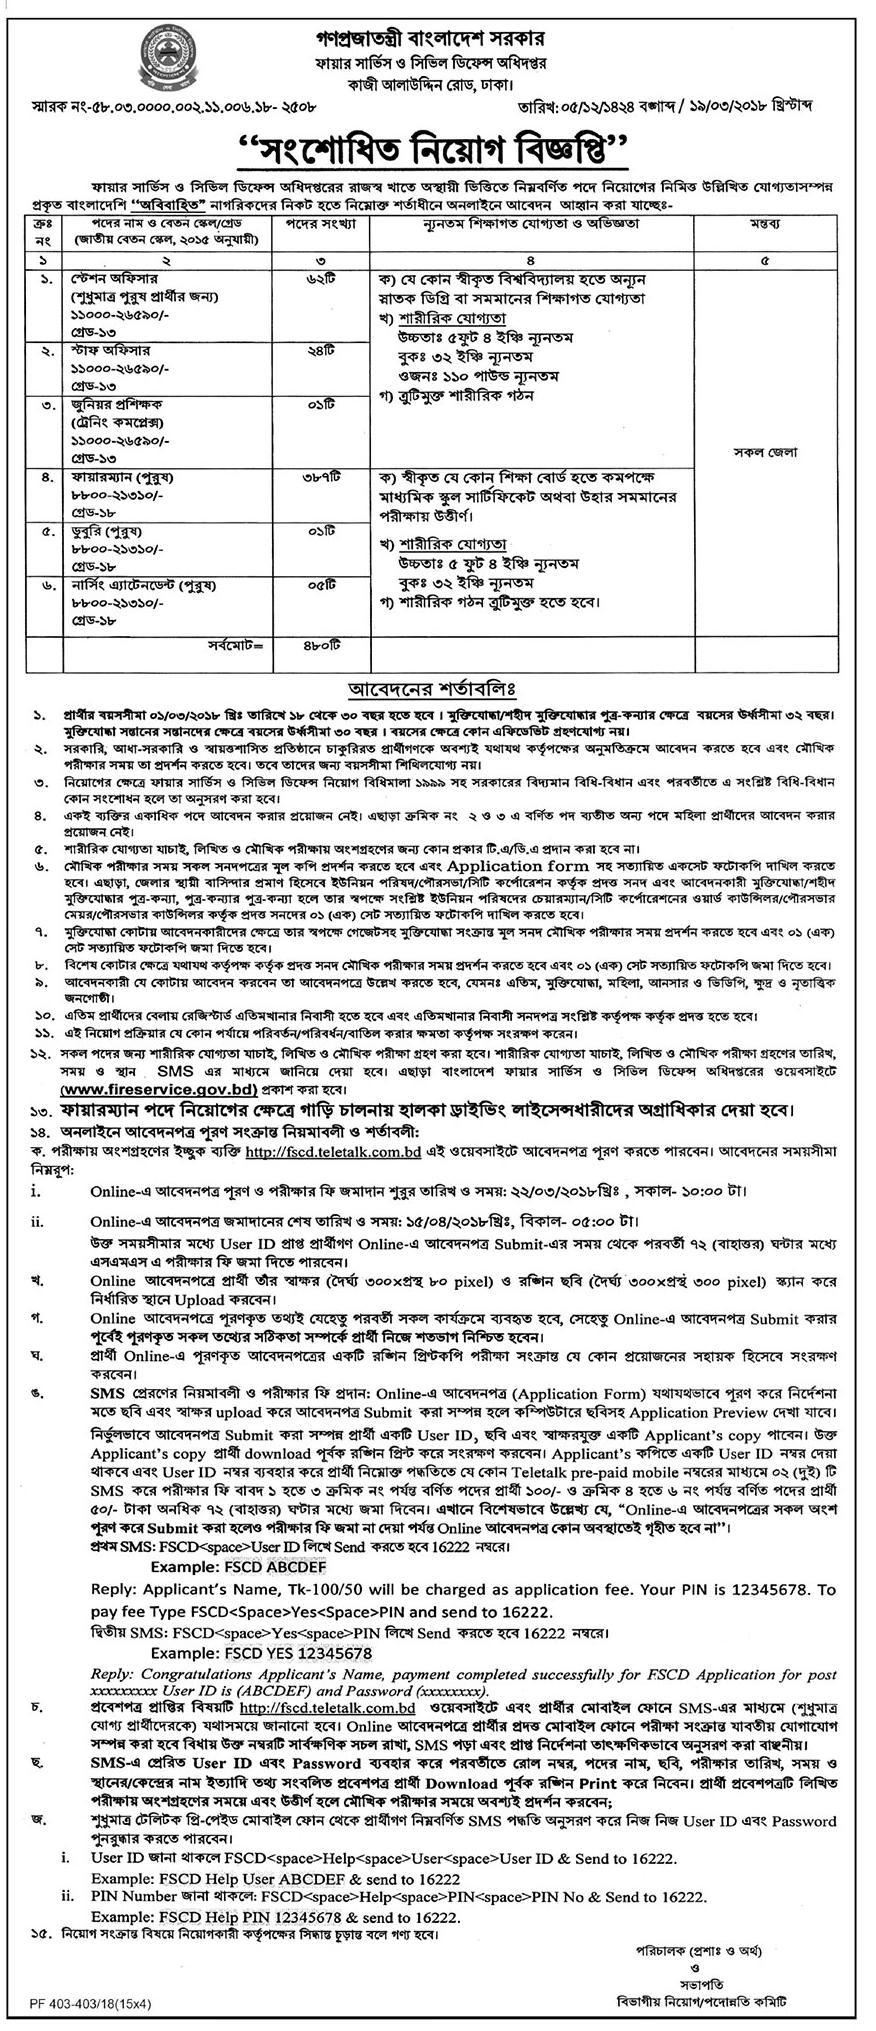 Bangladesh Fire Service Latest Job Circular